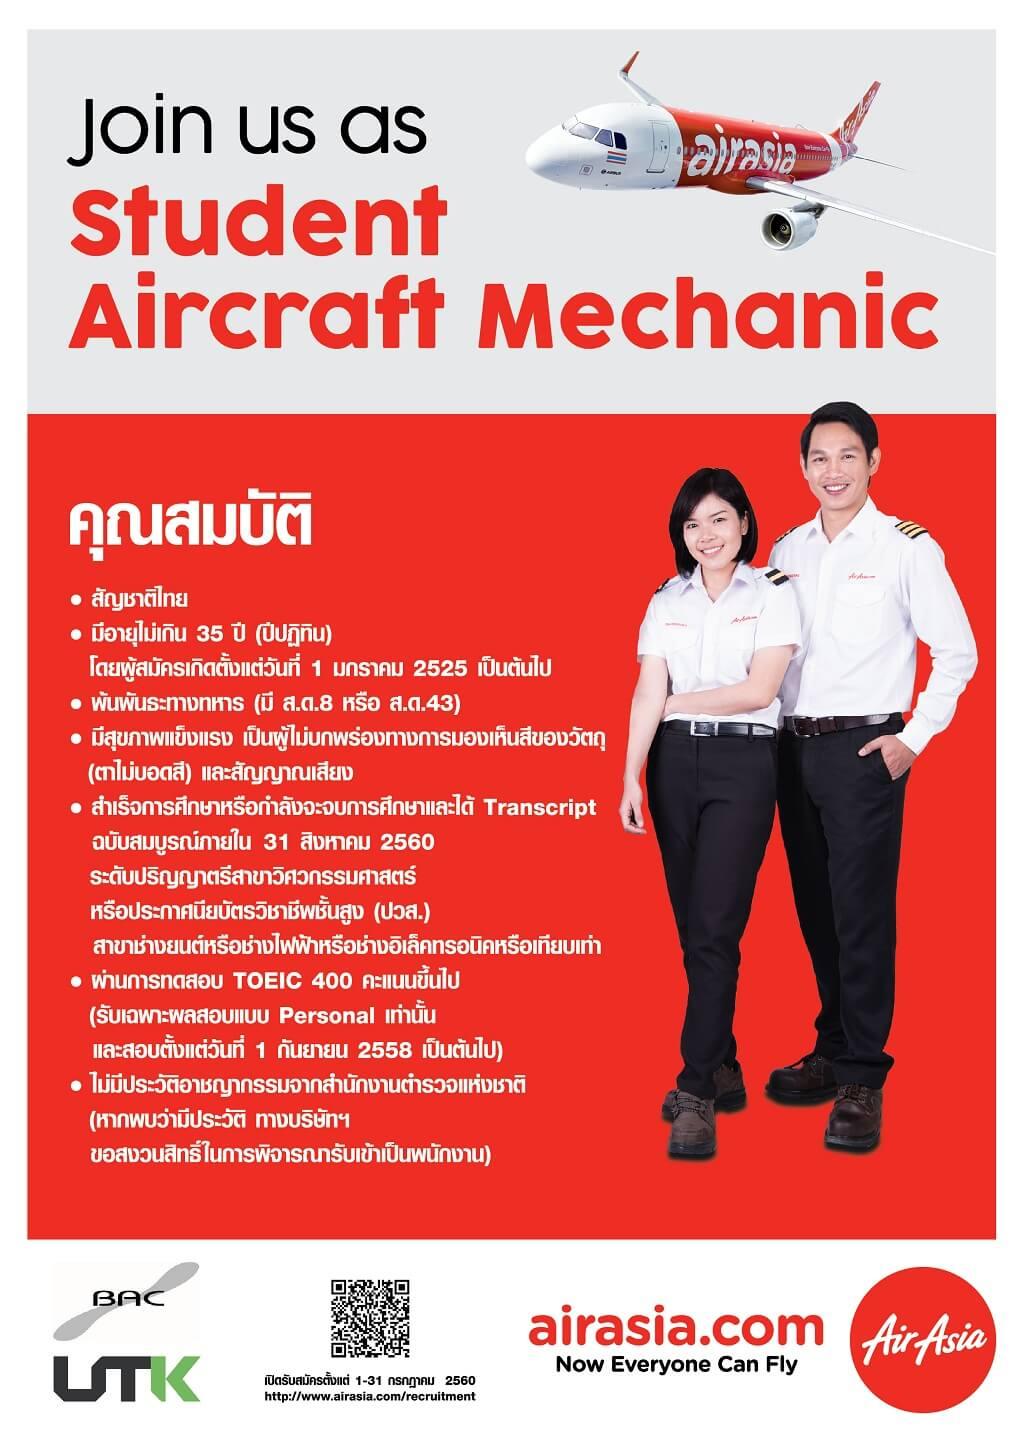 student aircraft mechanics สายการบินไทยแอรเอเชีย